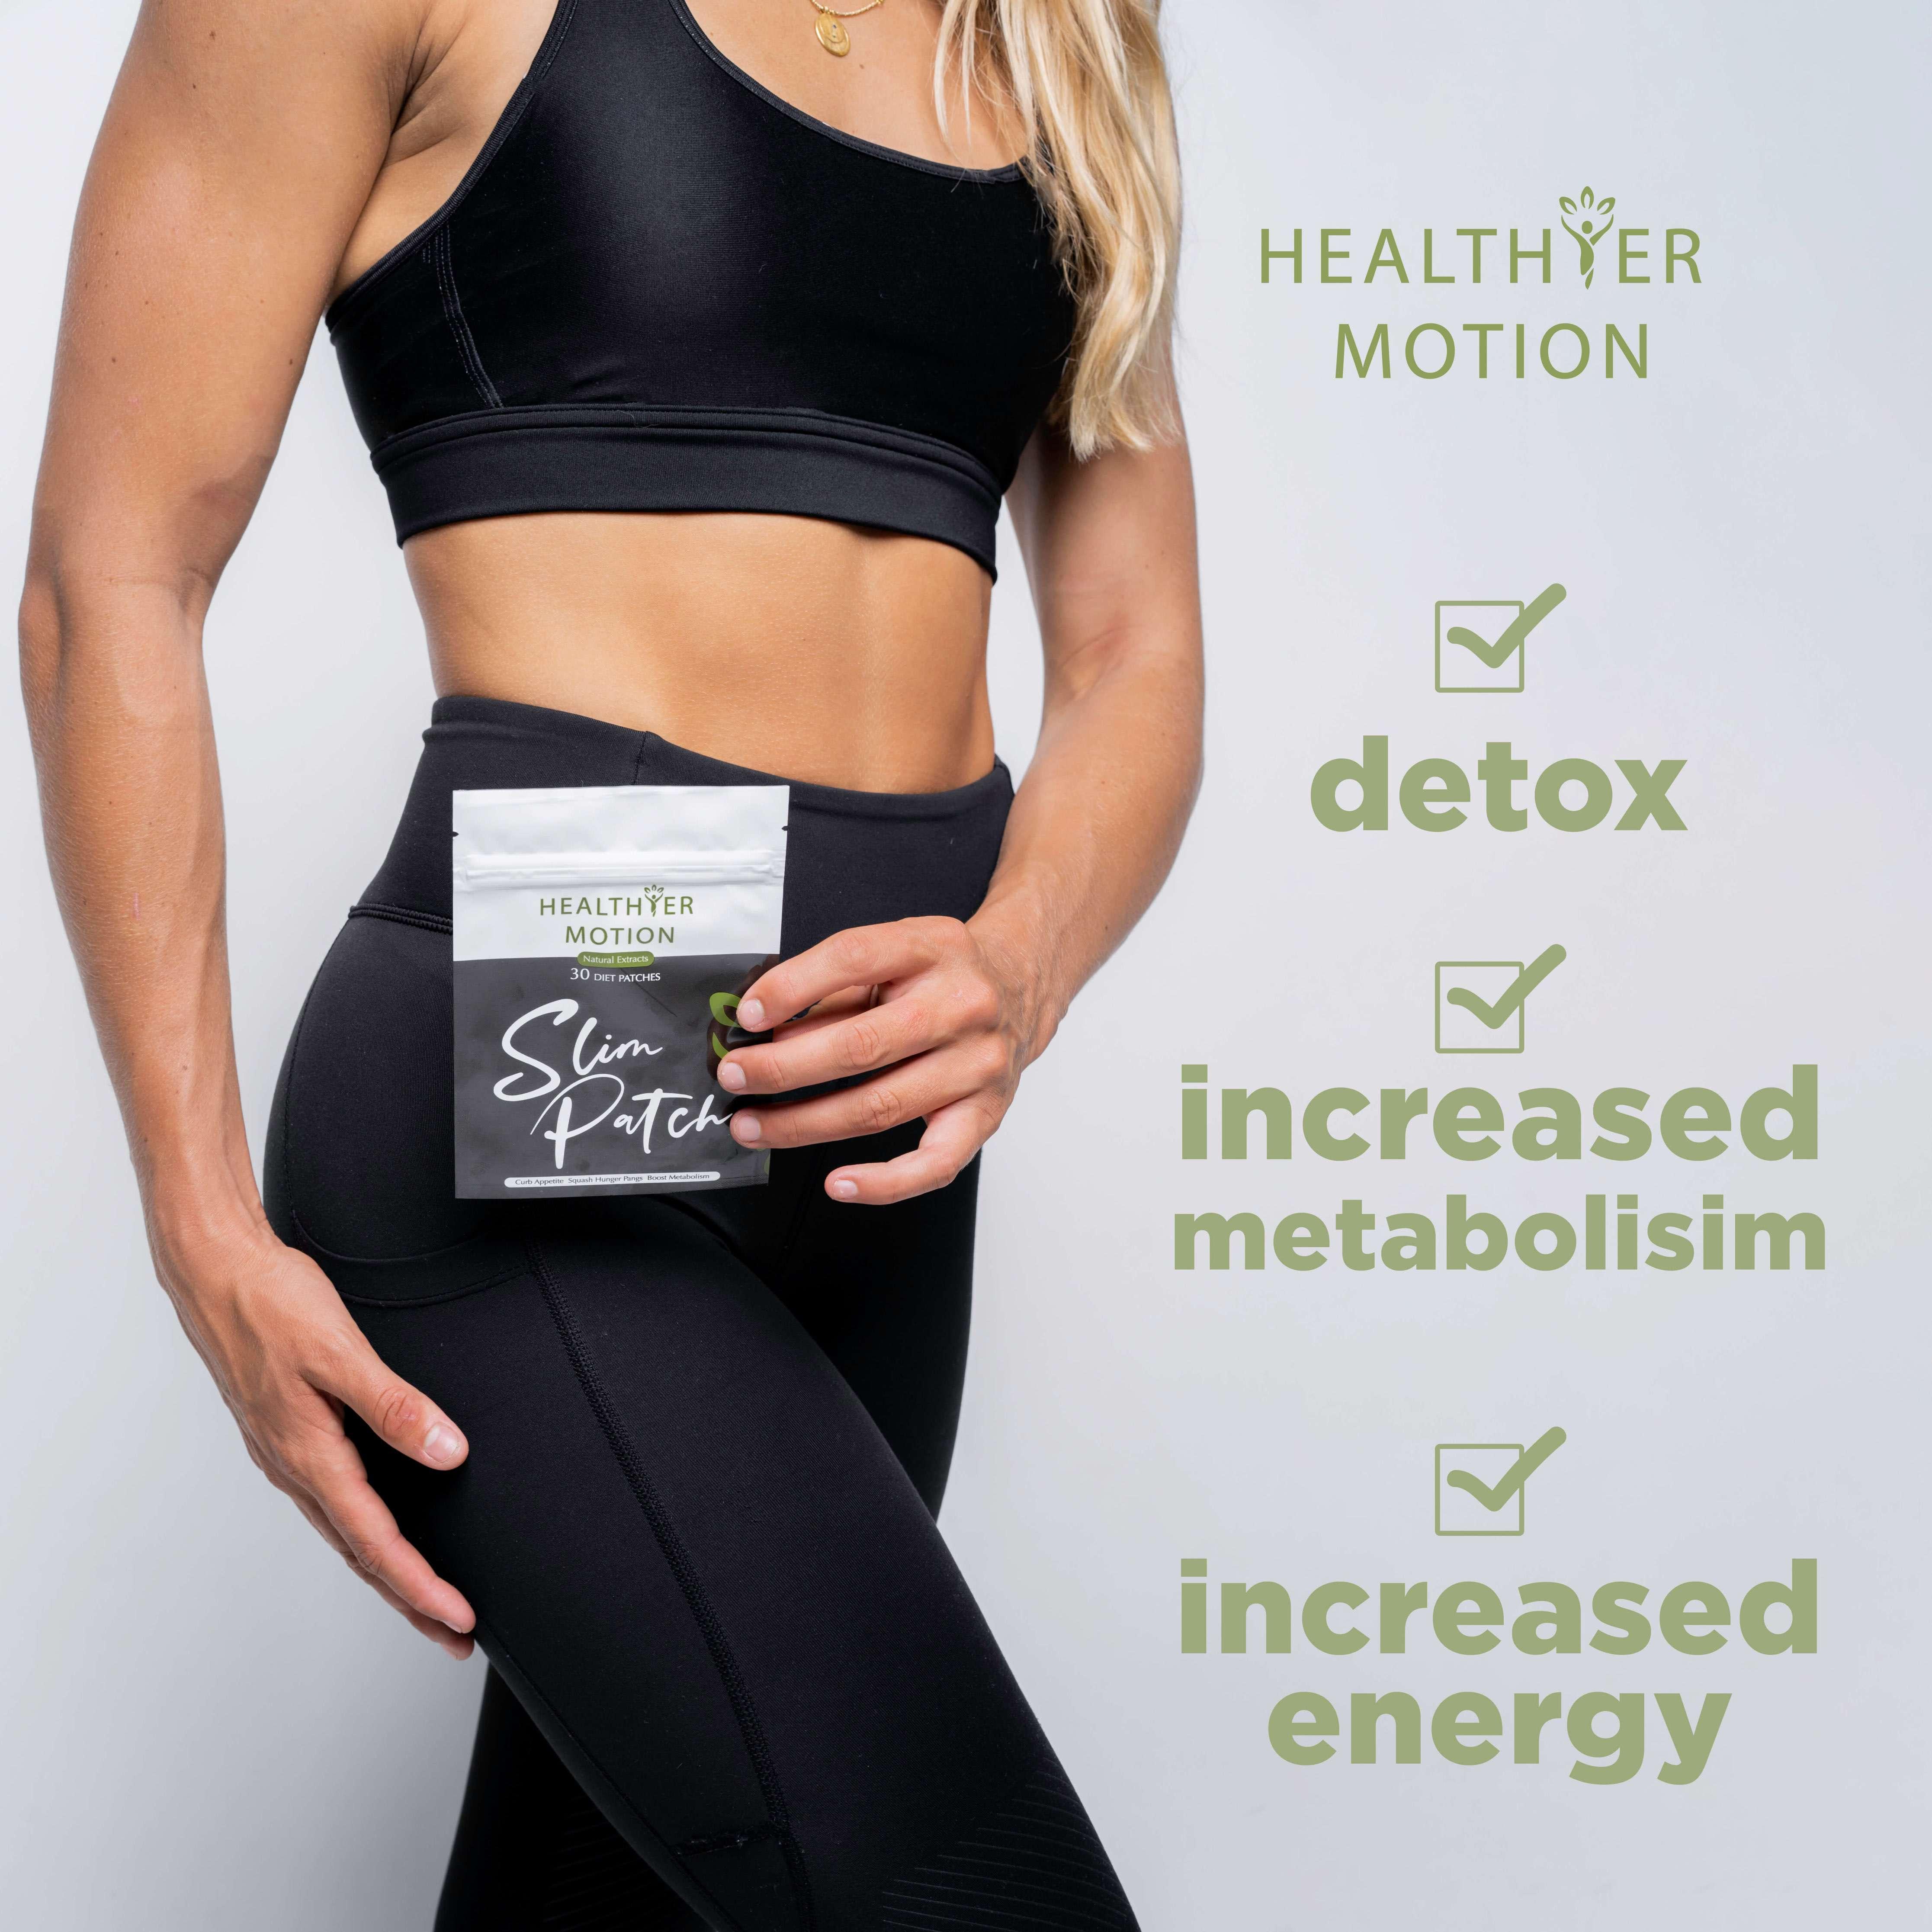 Healthier Motion Slim patches